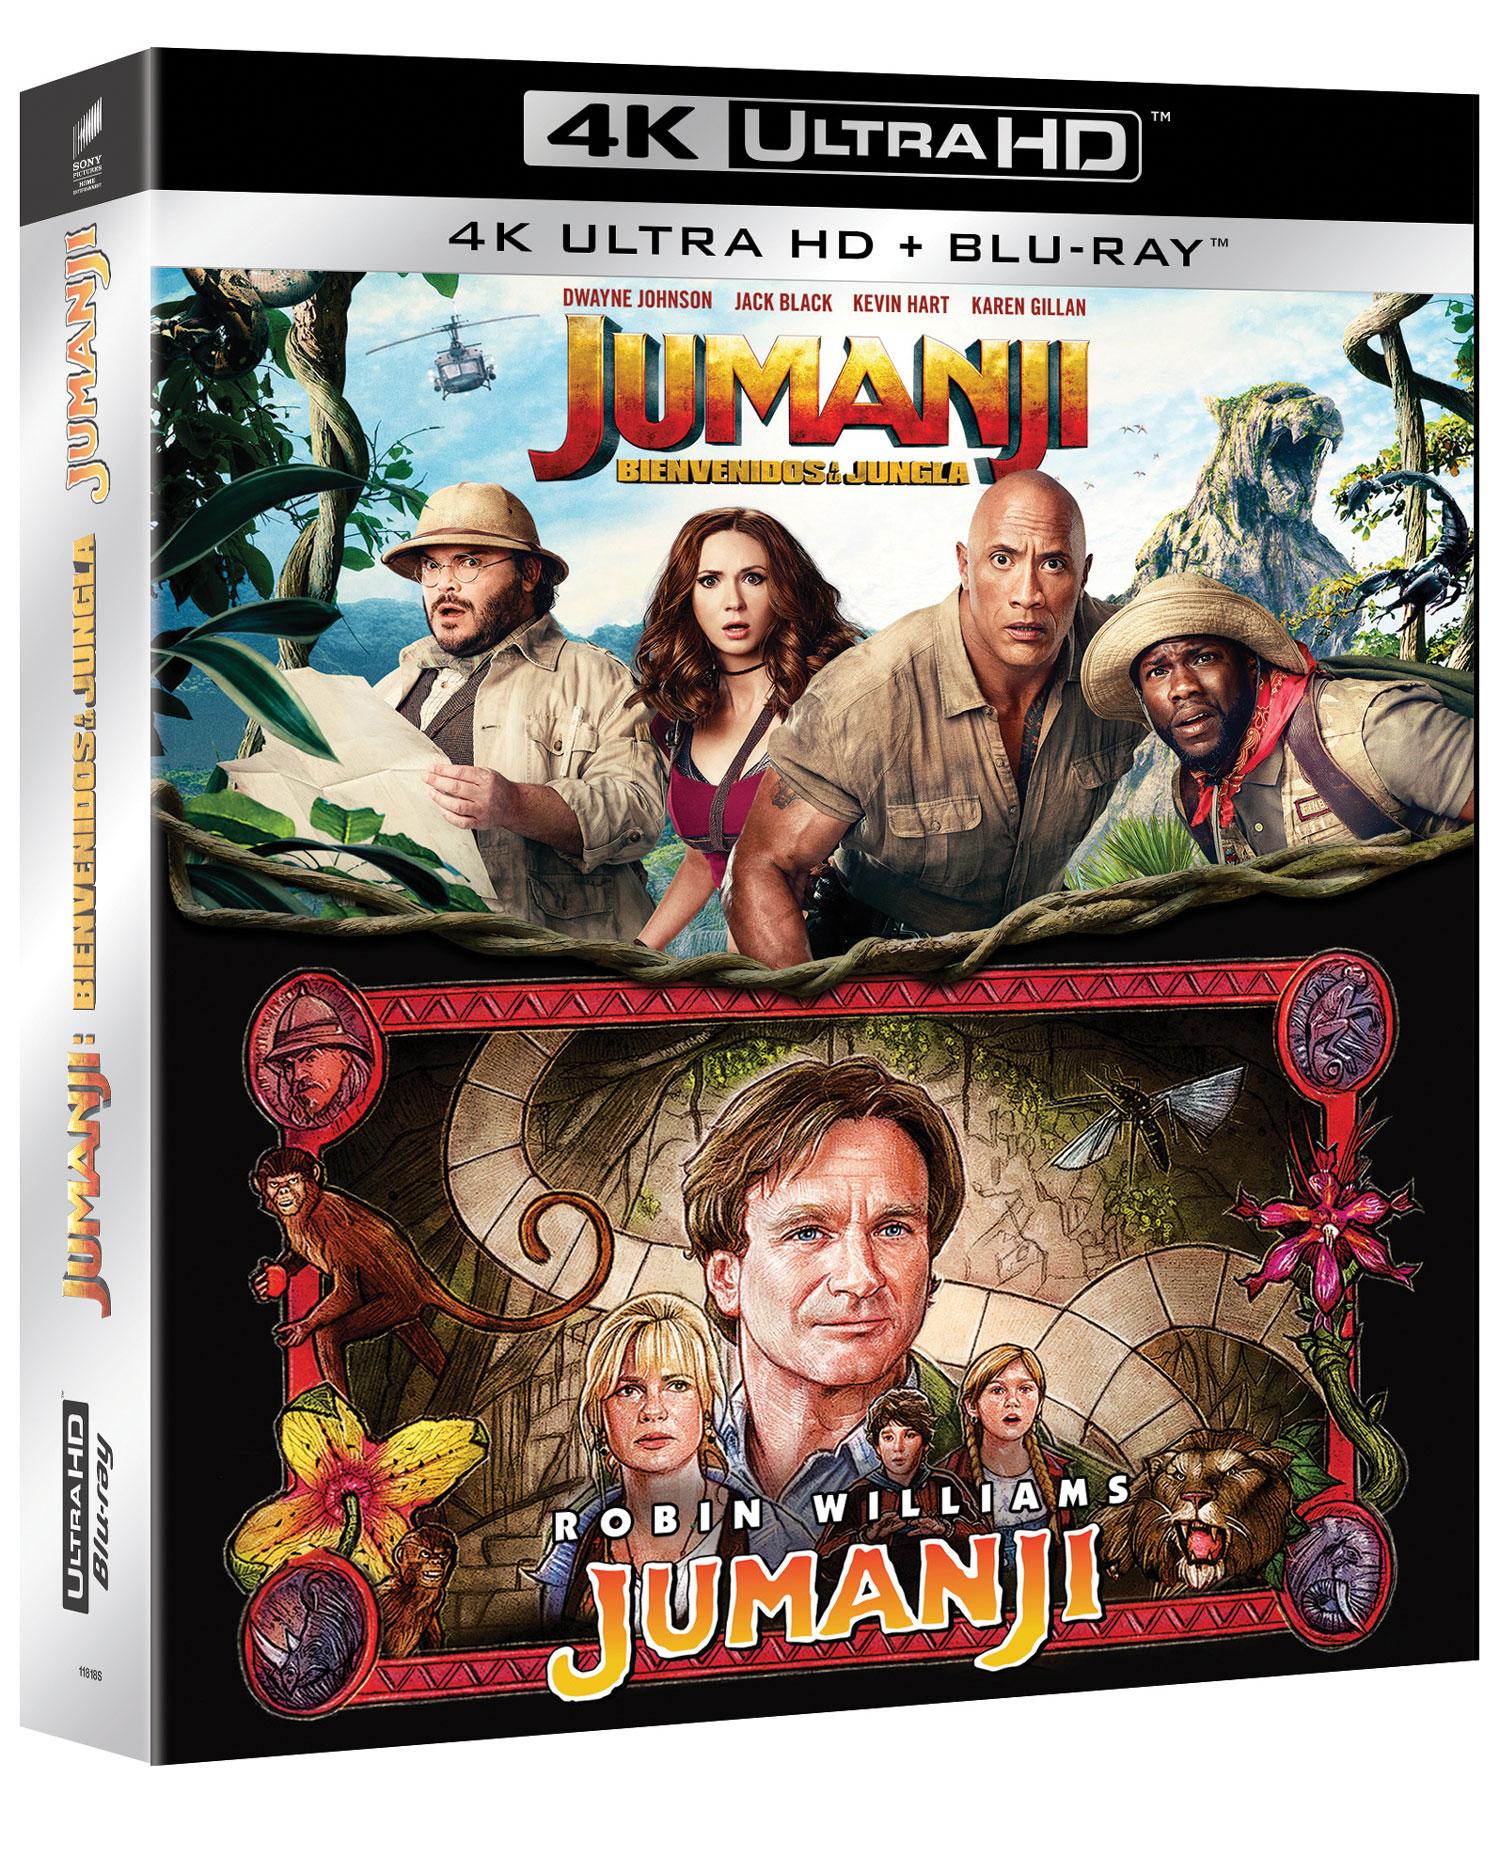 Pack 'Jumanji' 4K Ultra HD